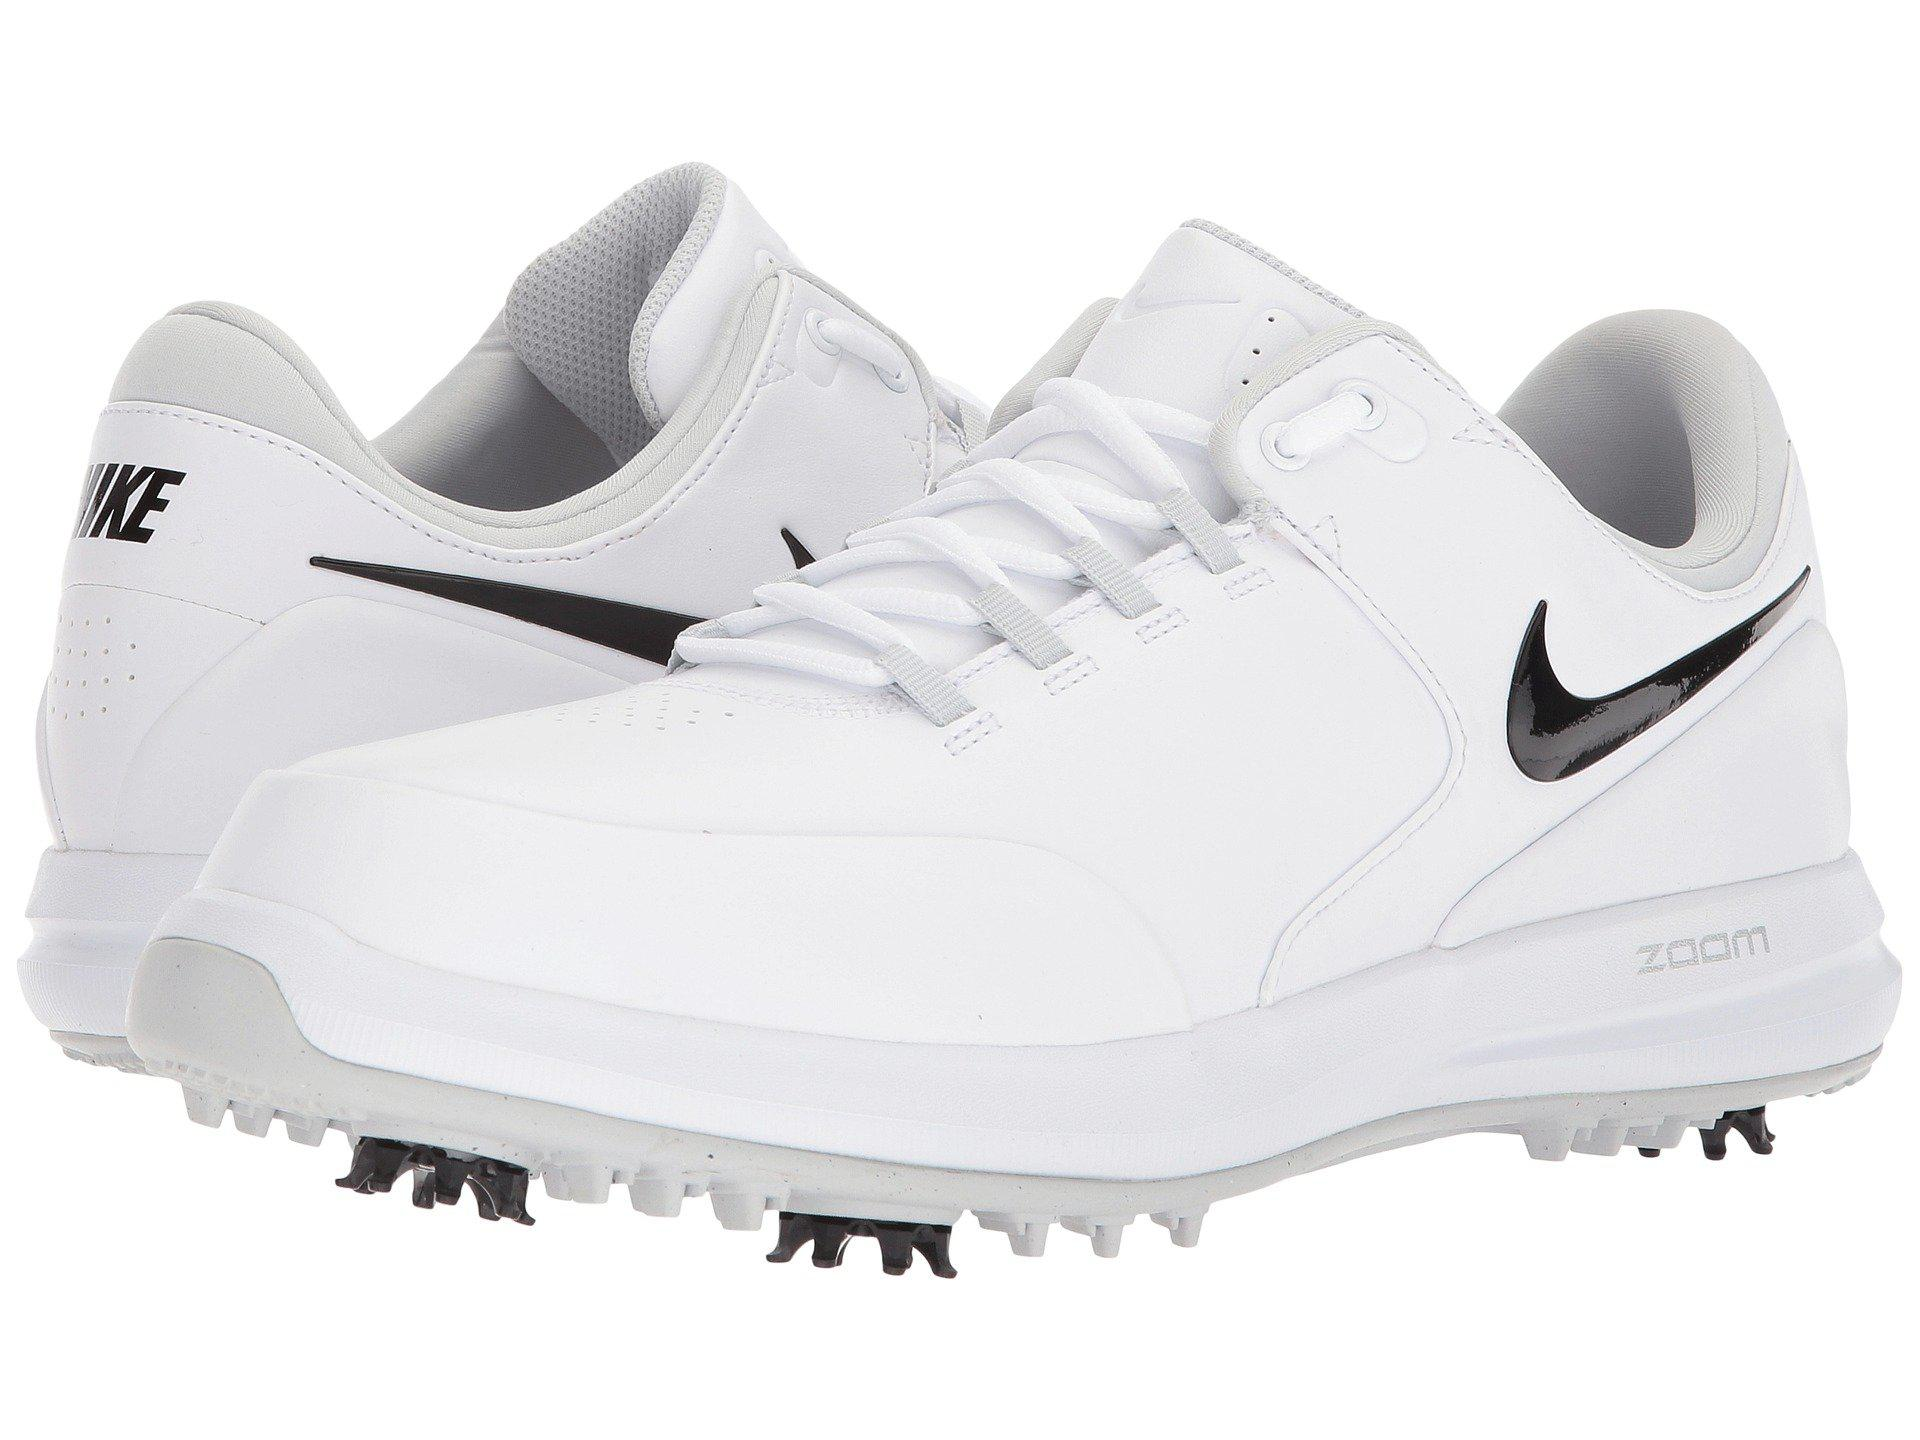 7b6533602b288 Lyst - Nike Air Zoom Accurate (white black metallic Silver pure ...